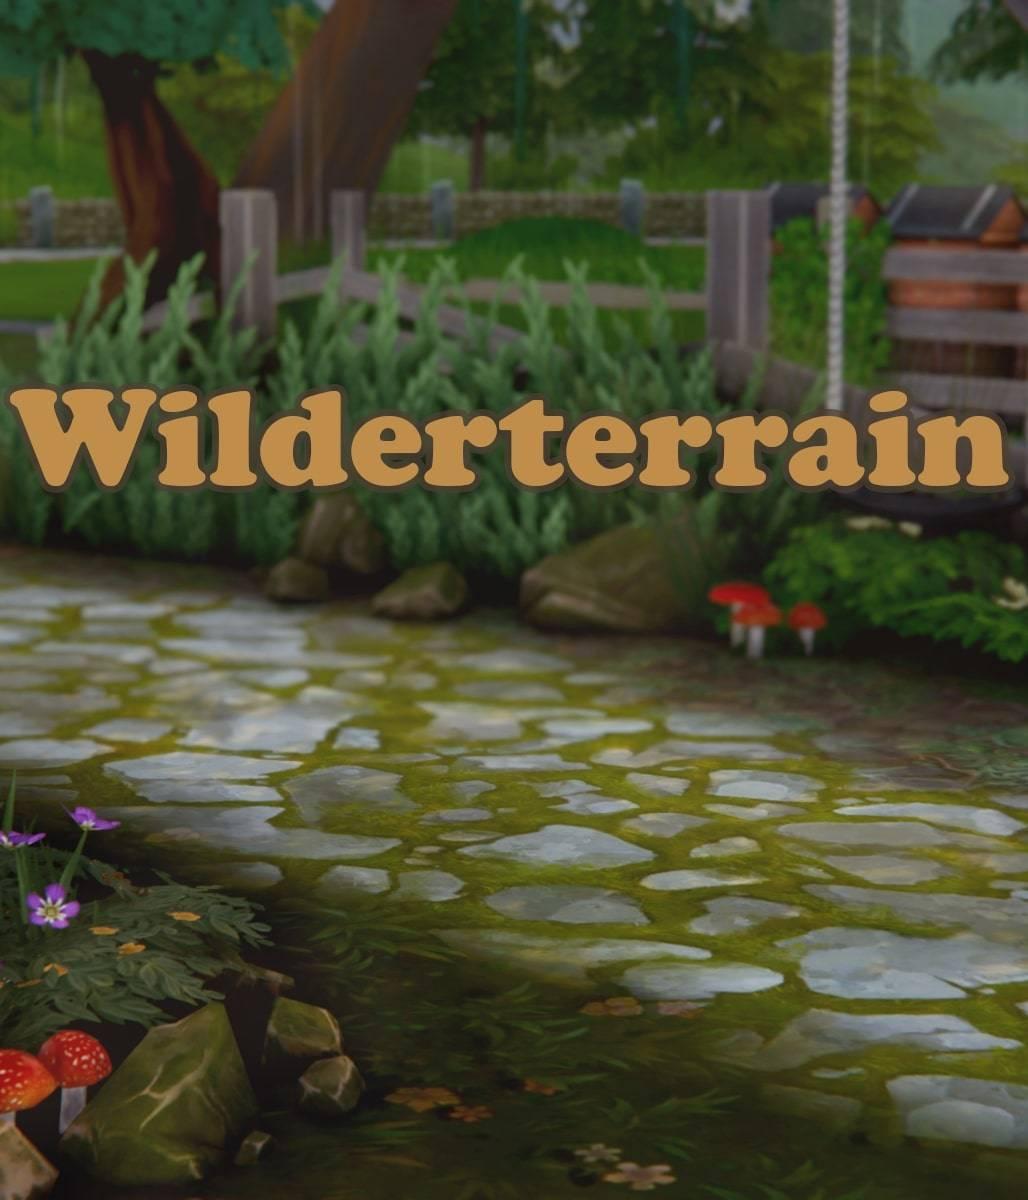 Набор покрытий для участка - Wilderterrain Set